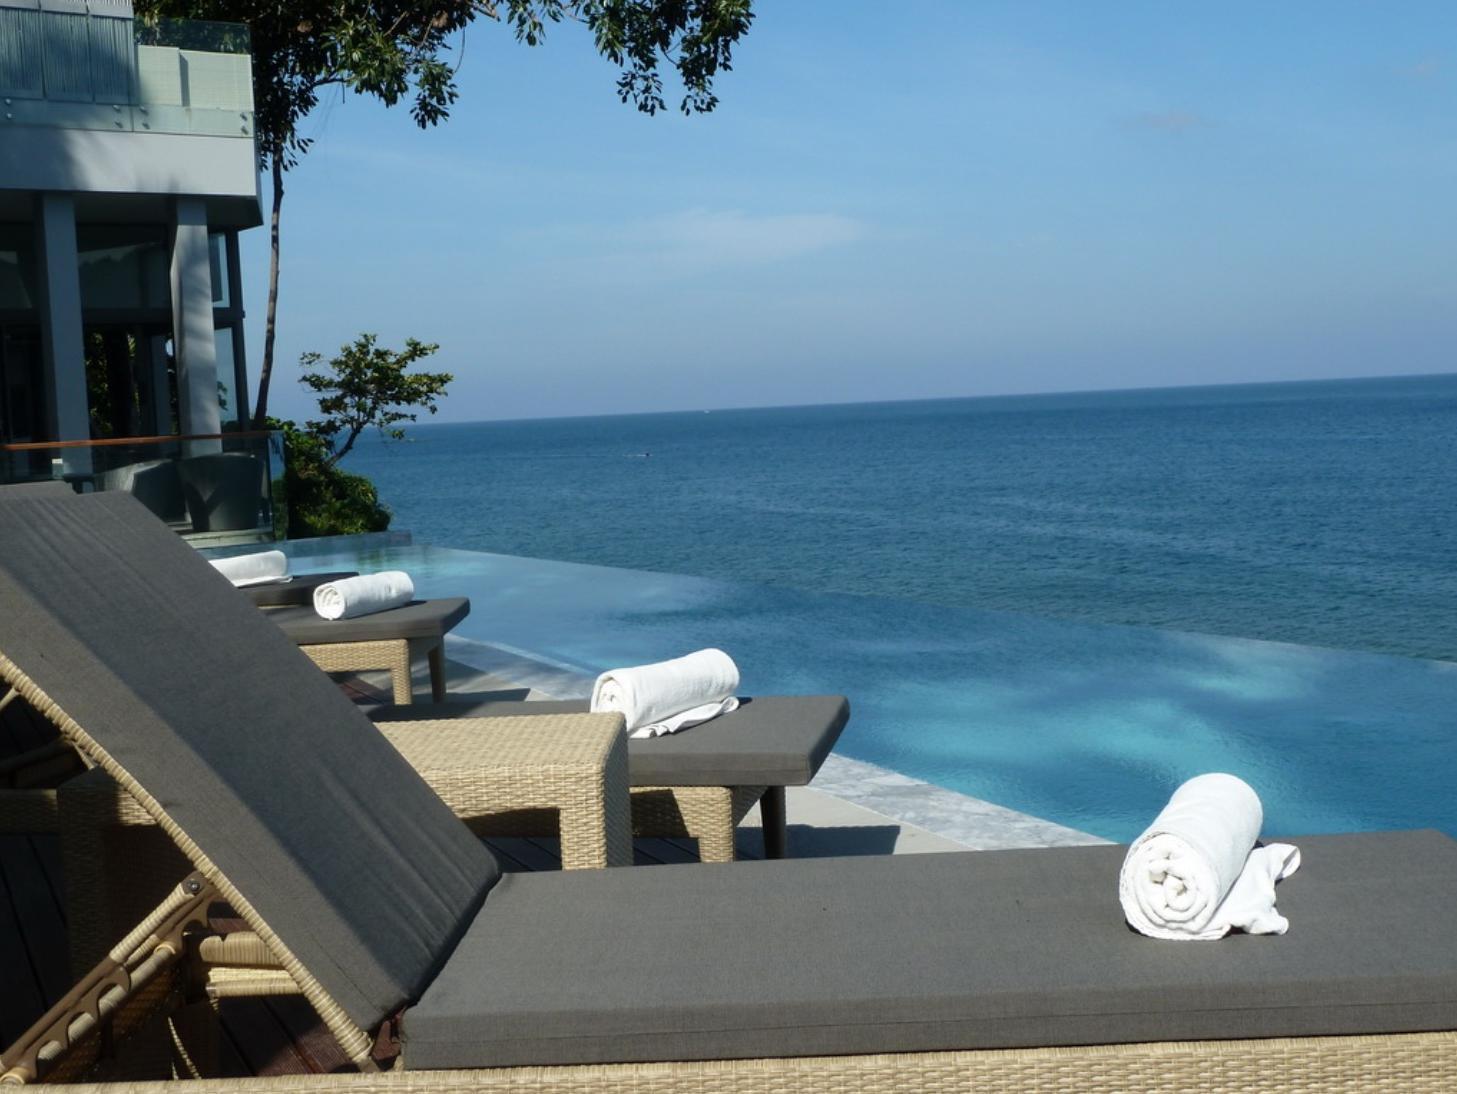 Cape Sienna Phuket Hotel and Villas14